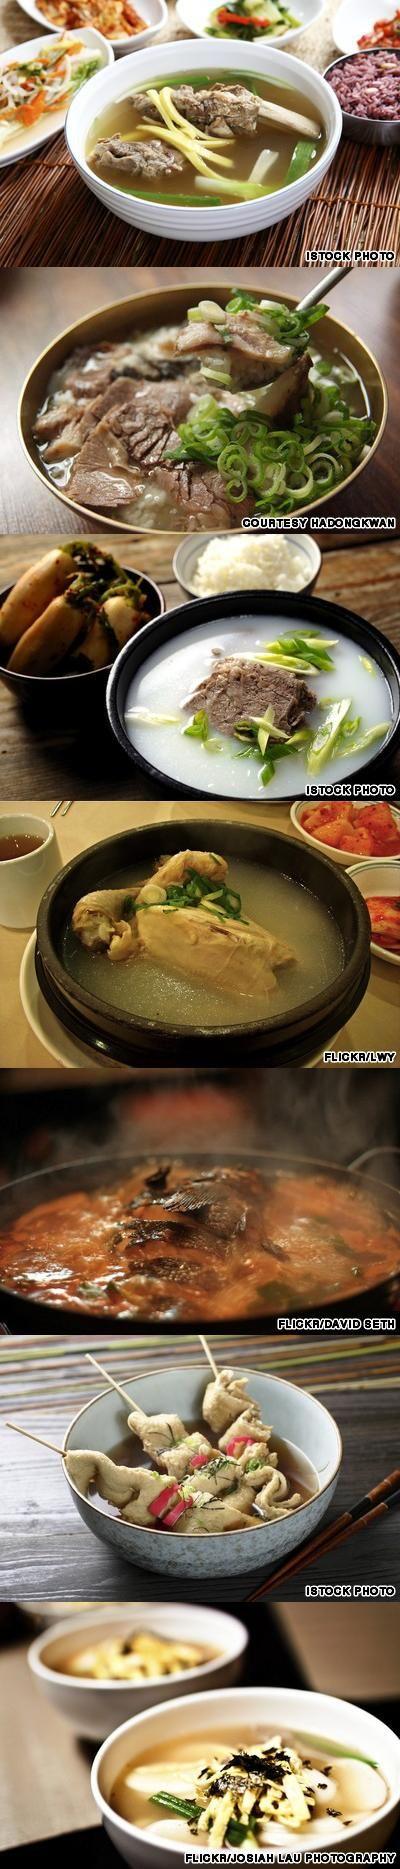 7 Korean soups up to bottom: Galbitang (갈비탕)/ Beef ribs soup - Gomtang (곰탕)/ Oxtail soup - Seolleongtang (설렁탕)/ Brisket soup - Samgyetang (삼계탕)/ Chicken soup - Dongtae jjigae (동태찌개)/ Pollock stew - Uhmook tang (어묵탕)/ Fish cake soup - Tteokguk (떡국)/ Rice cake soup